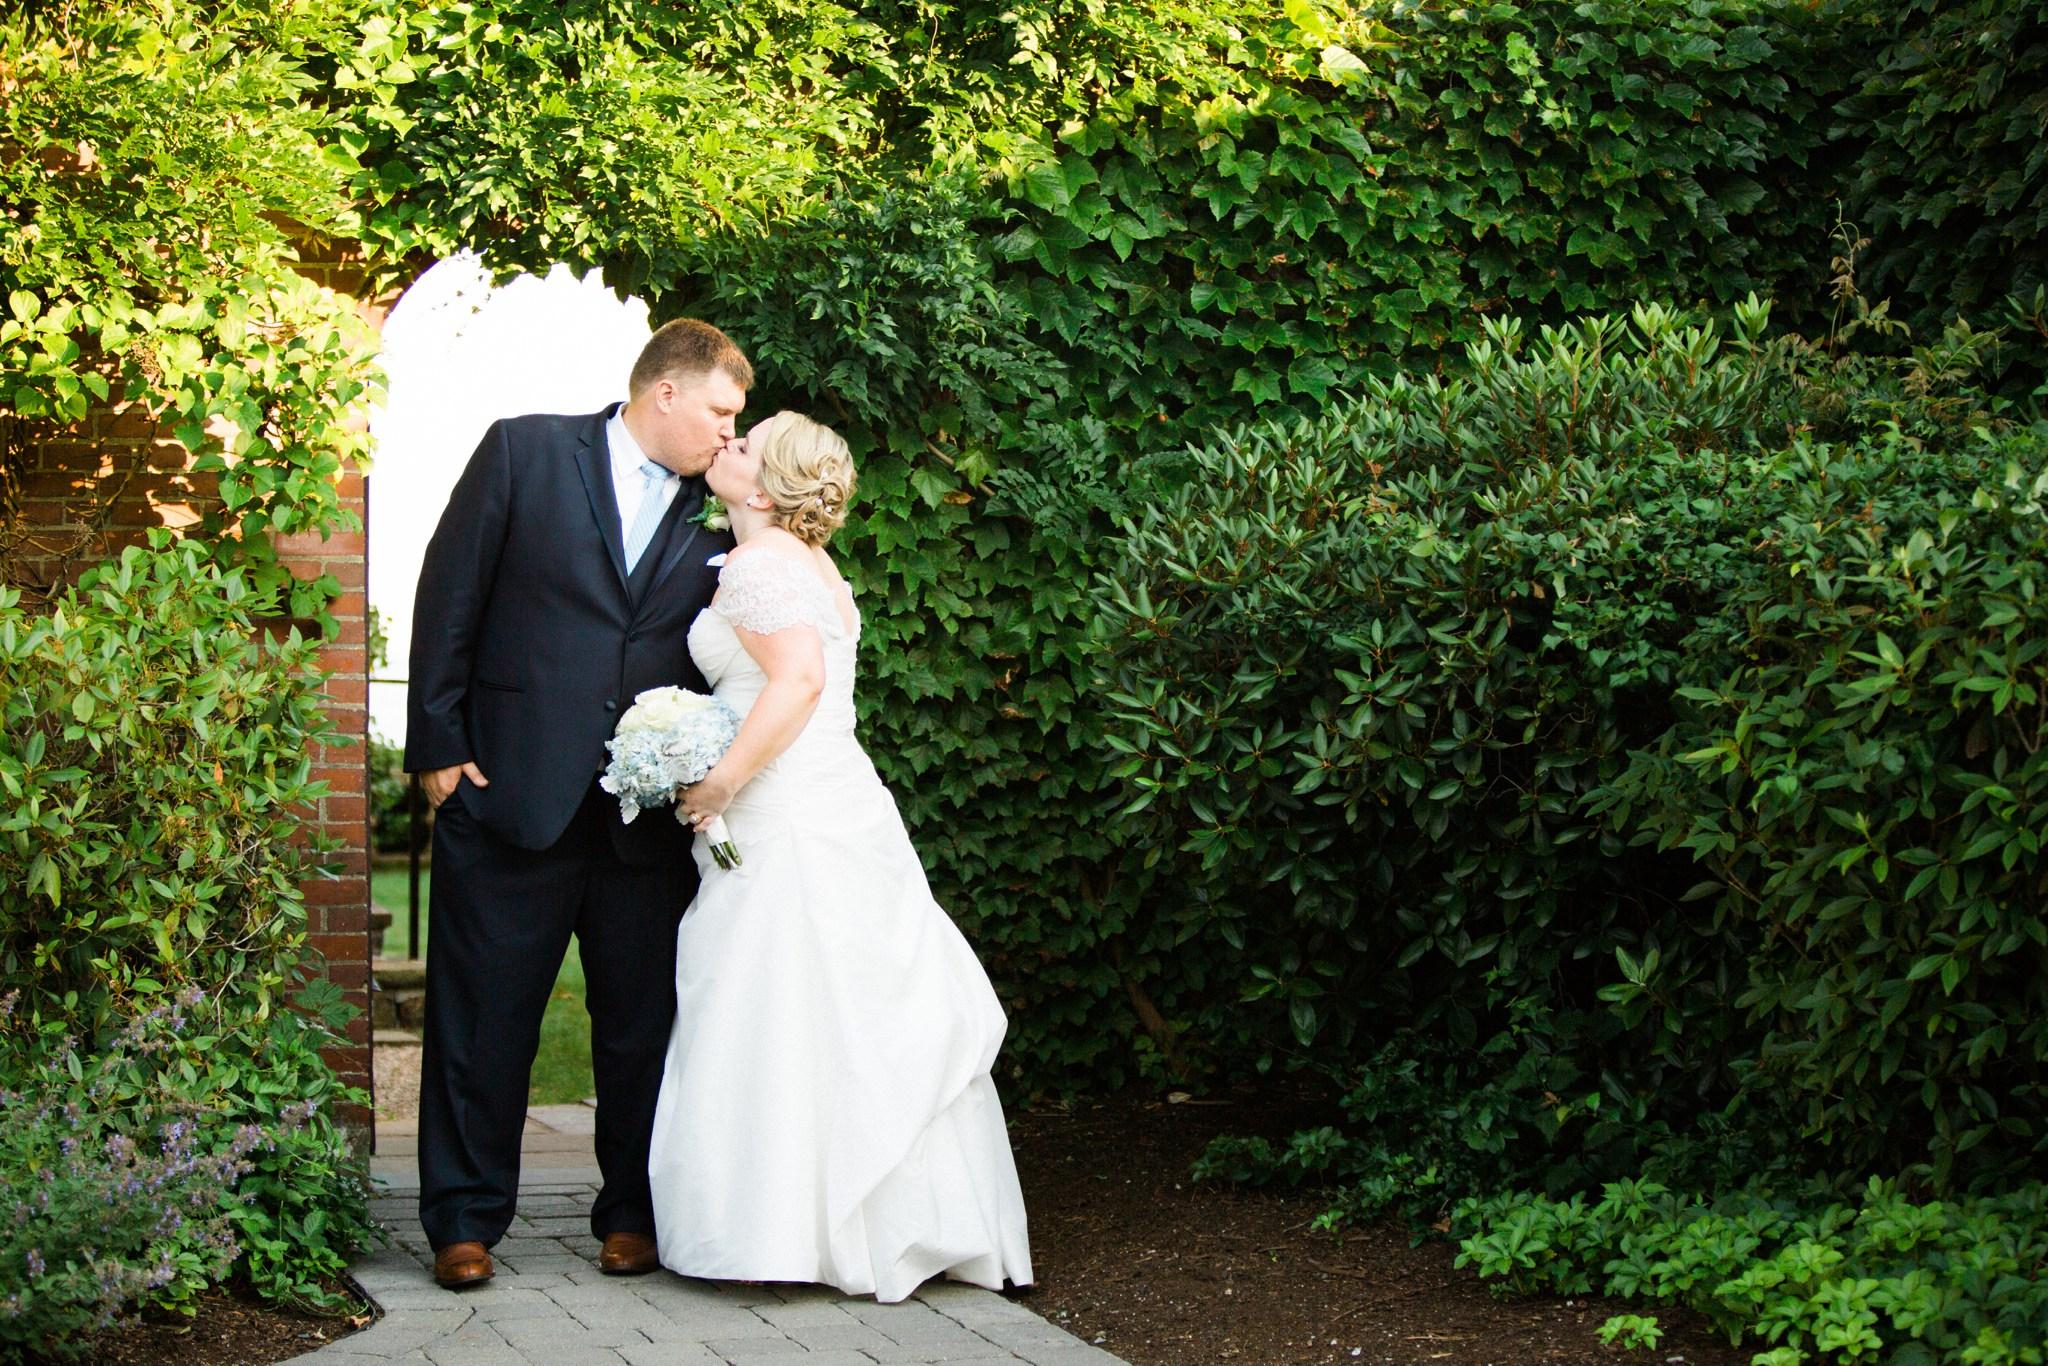 misselwood_endicott_college_wedding_photos_00075.JPG